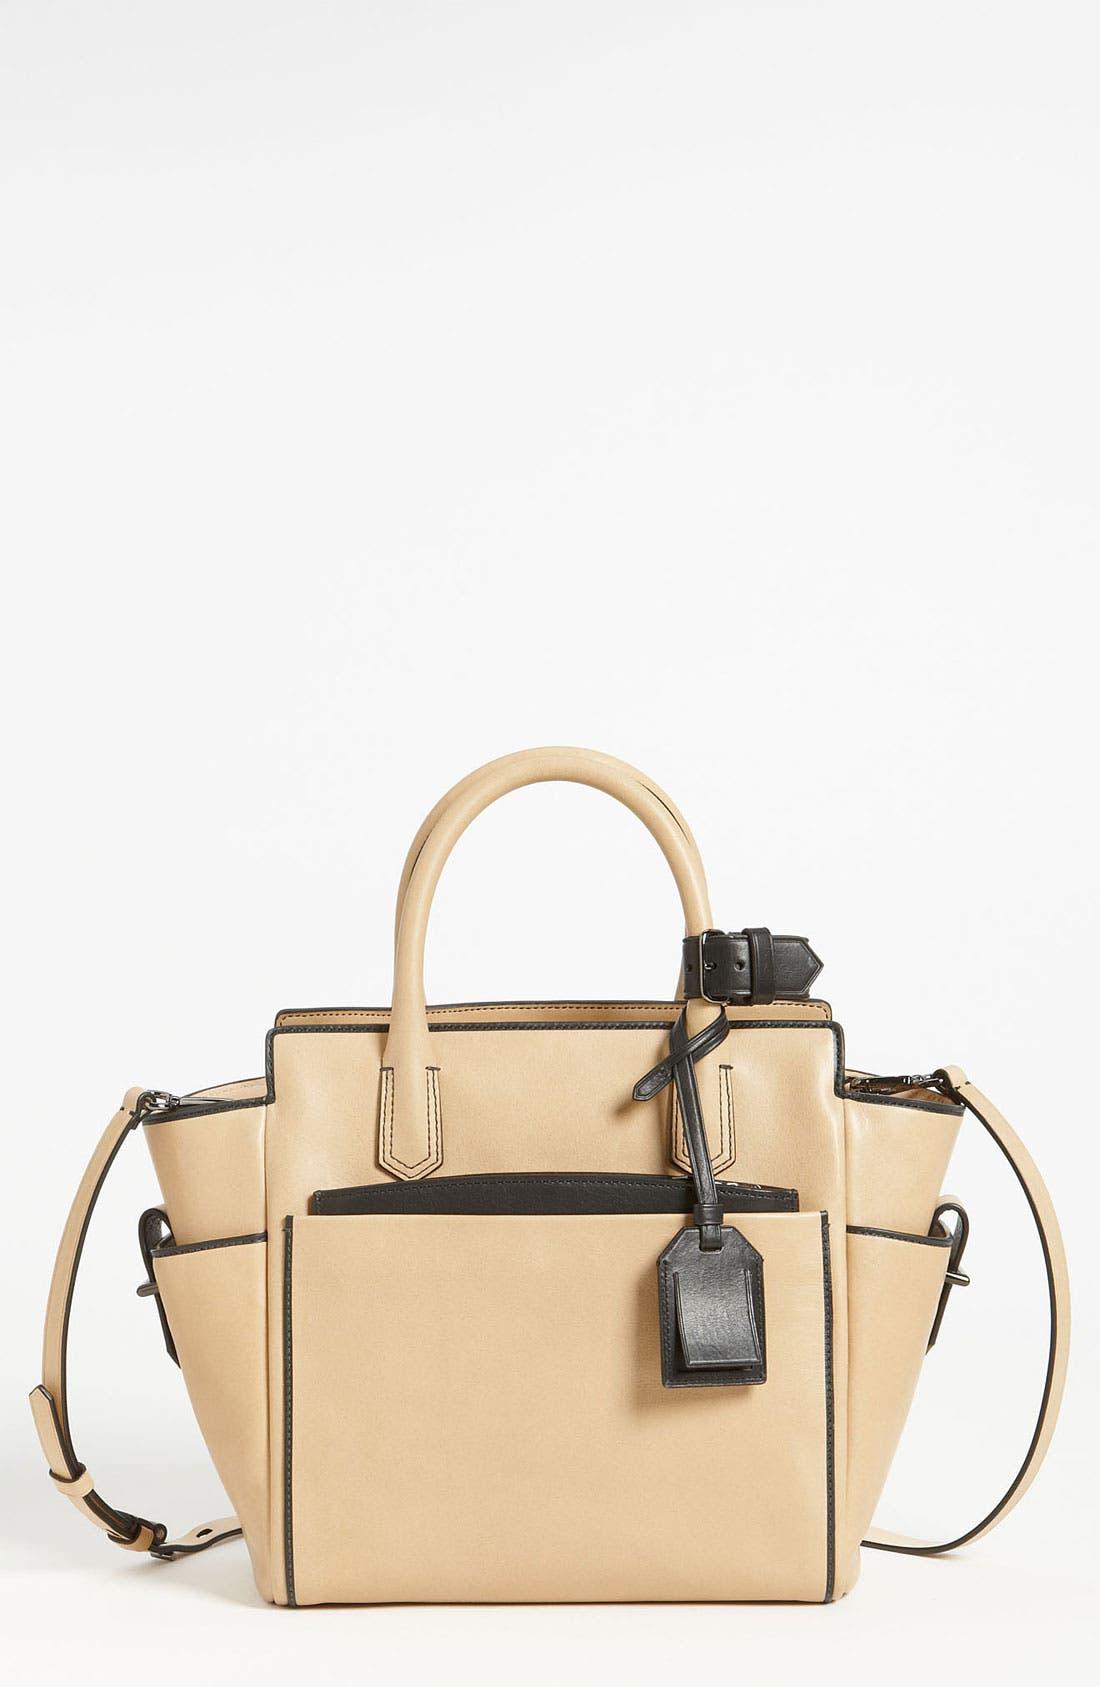 Alternate Image 1 Selected - Reed Krakoff 'Mini Atlantique' Leather Satchel